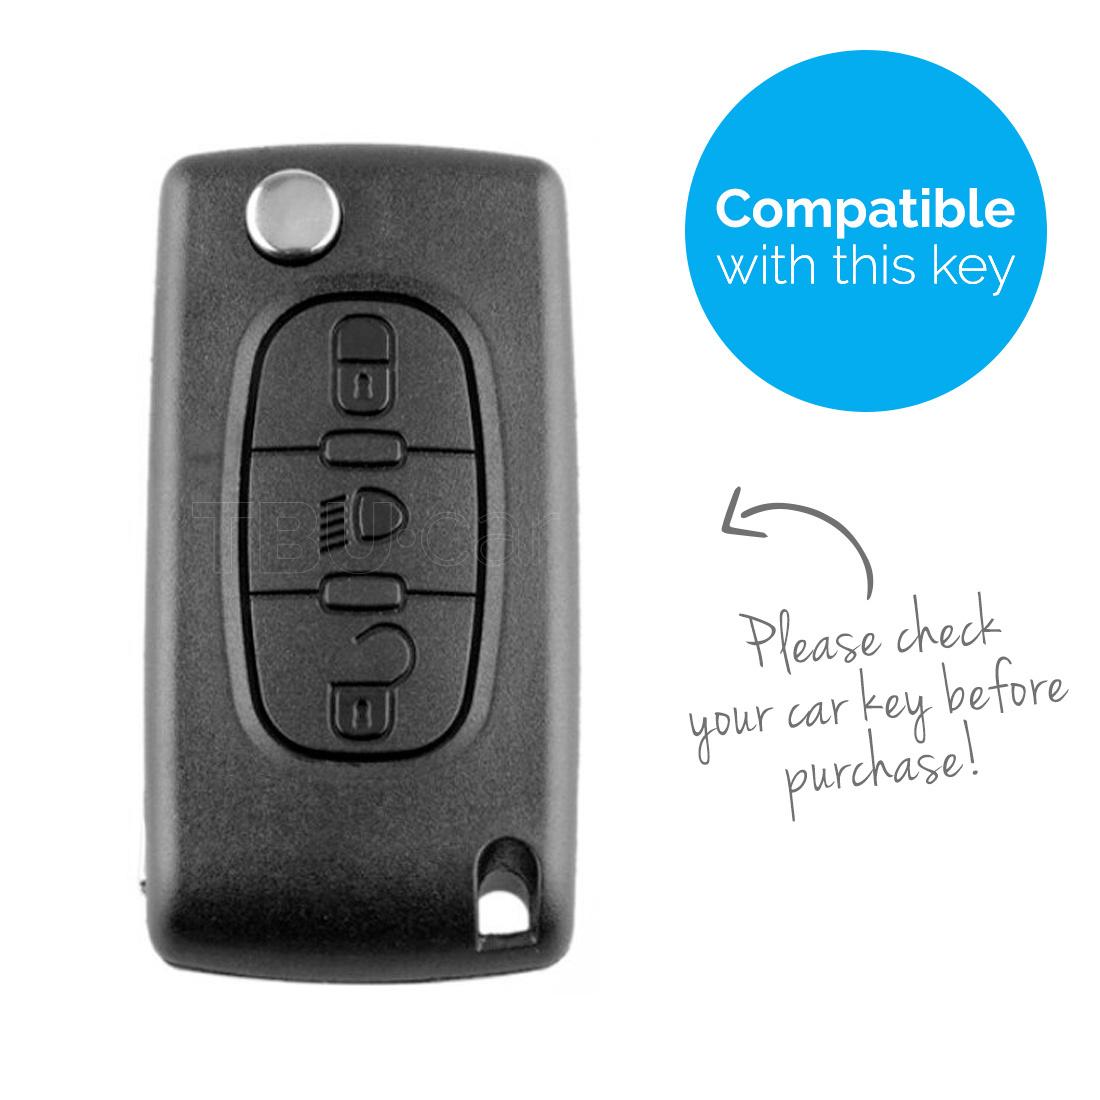 TBU car TBU car Sleutel cover compatibel met Peugeot - Silicone sleutelhoesje - beschermhoesje autosleutel - Paars